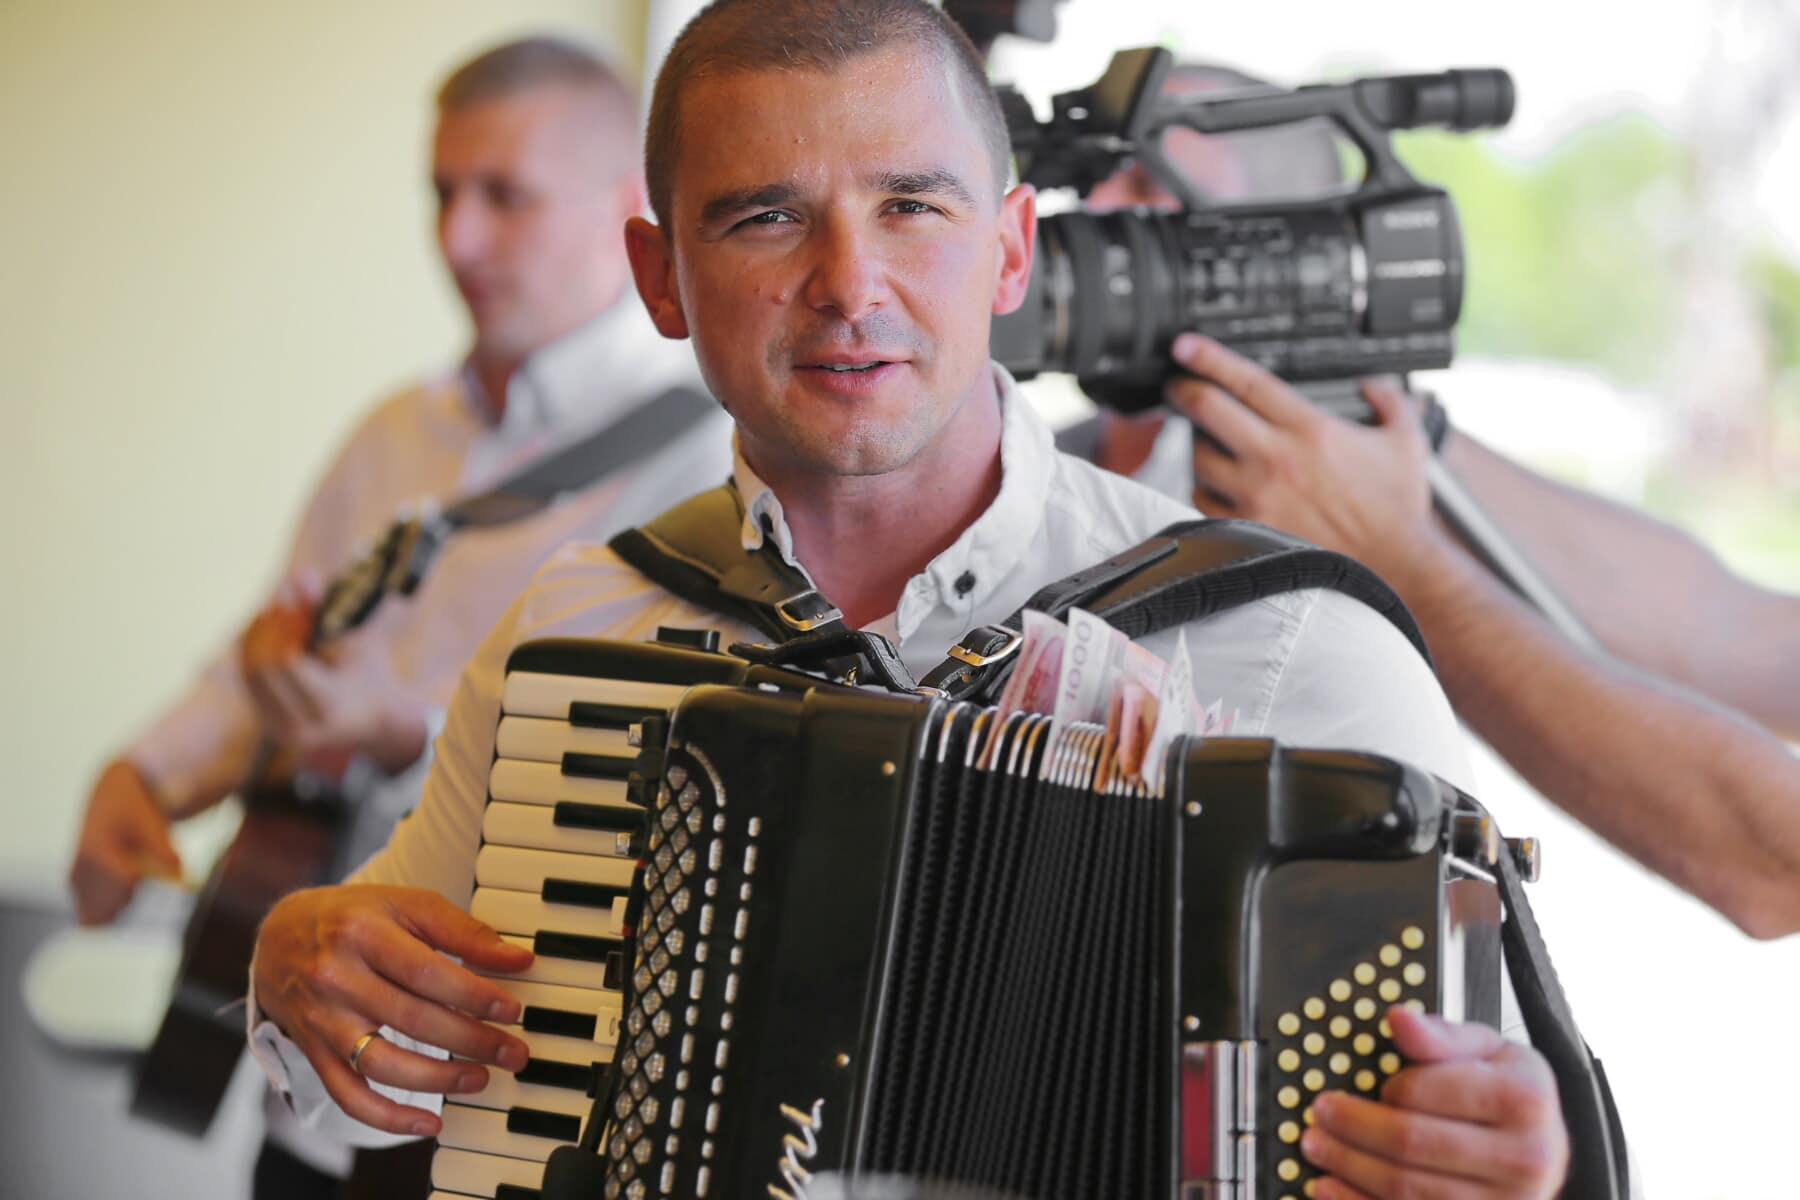 singer, man, accordion, music, people, portrait, musician, movie, journalist, festival